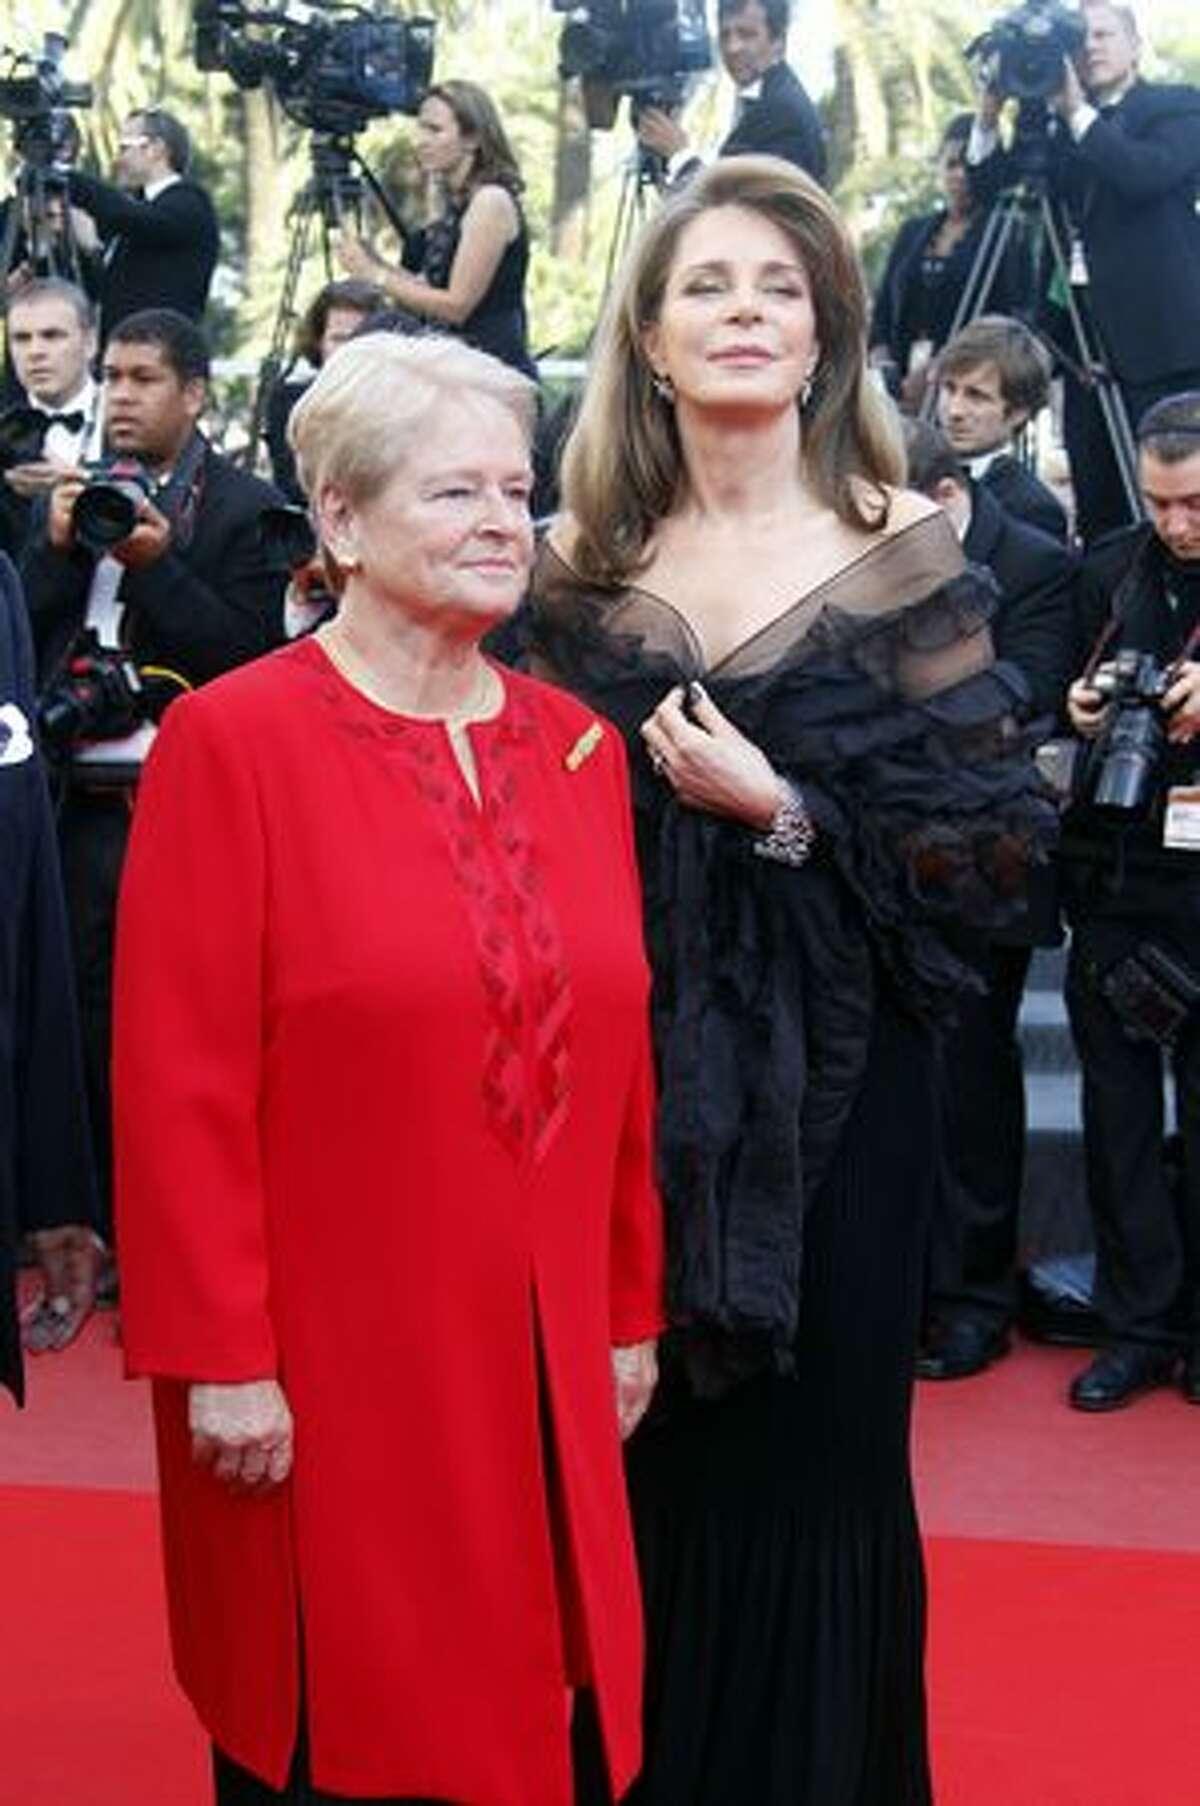 Queen Noor of Jordan (R) and former Norway's Prime Minister Dr Gro Bruntland (C) arrive for the screening of